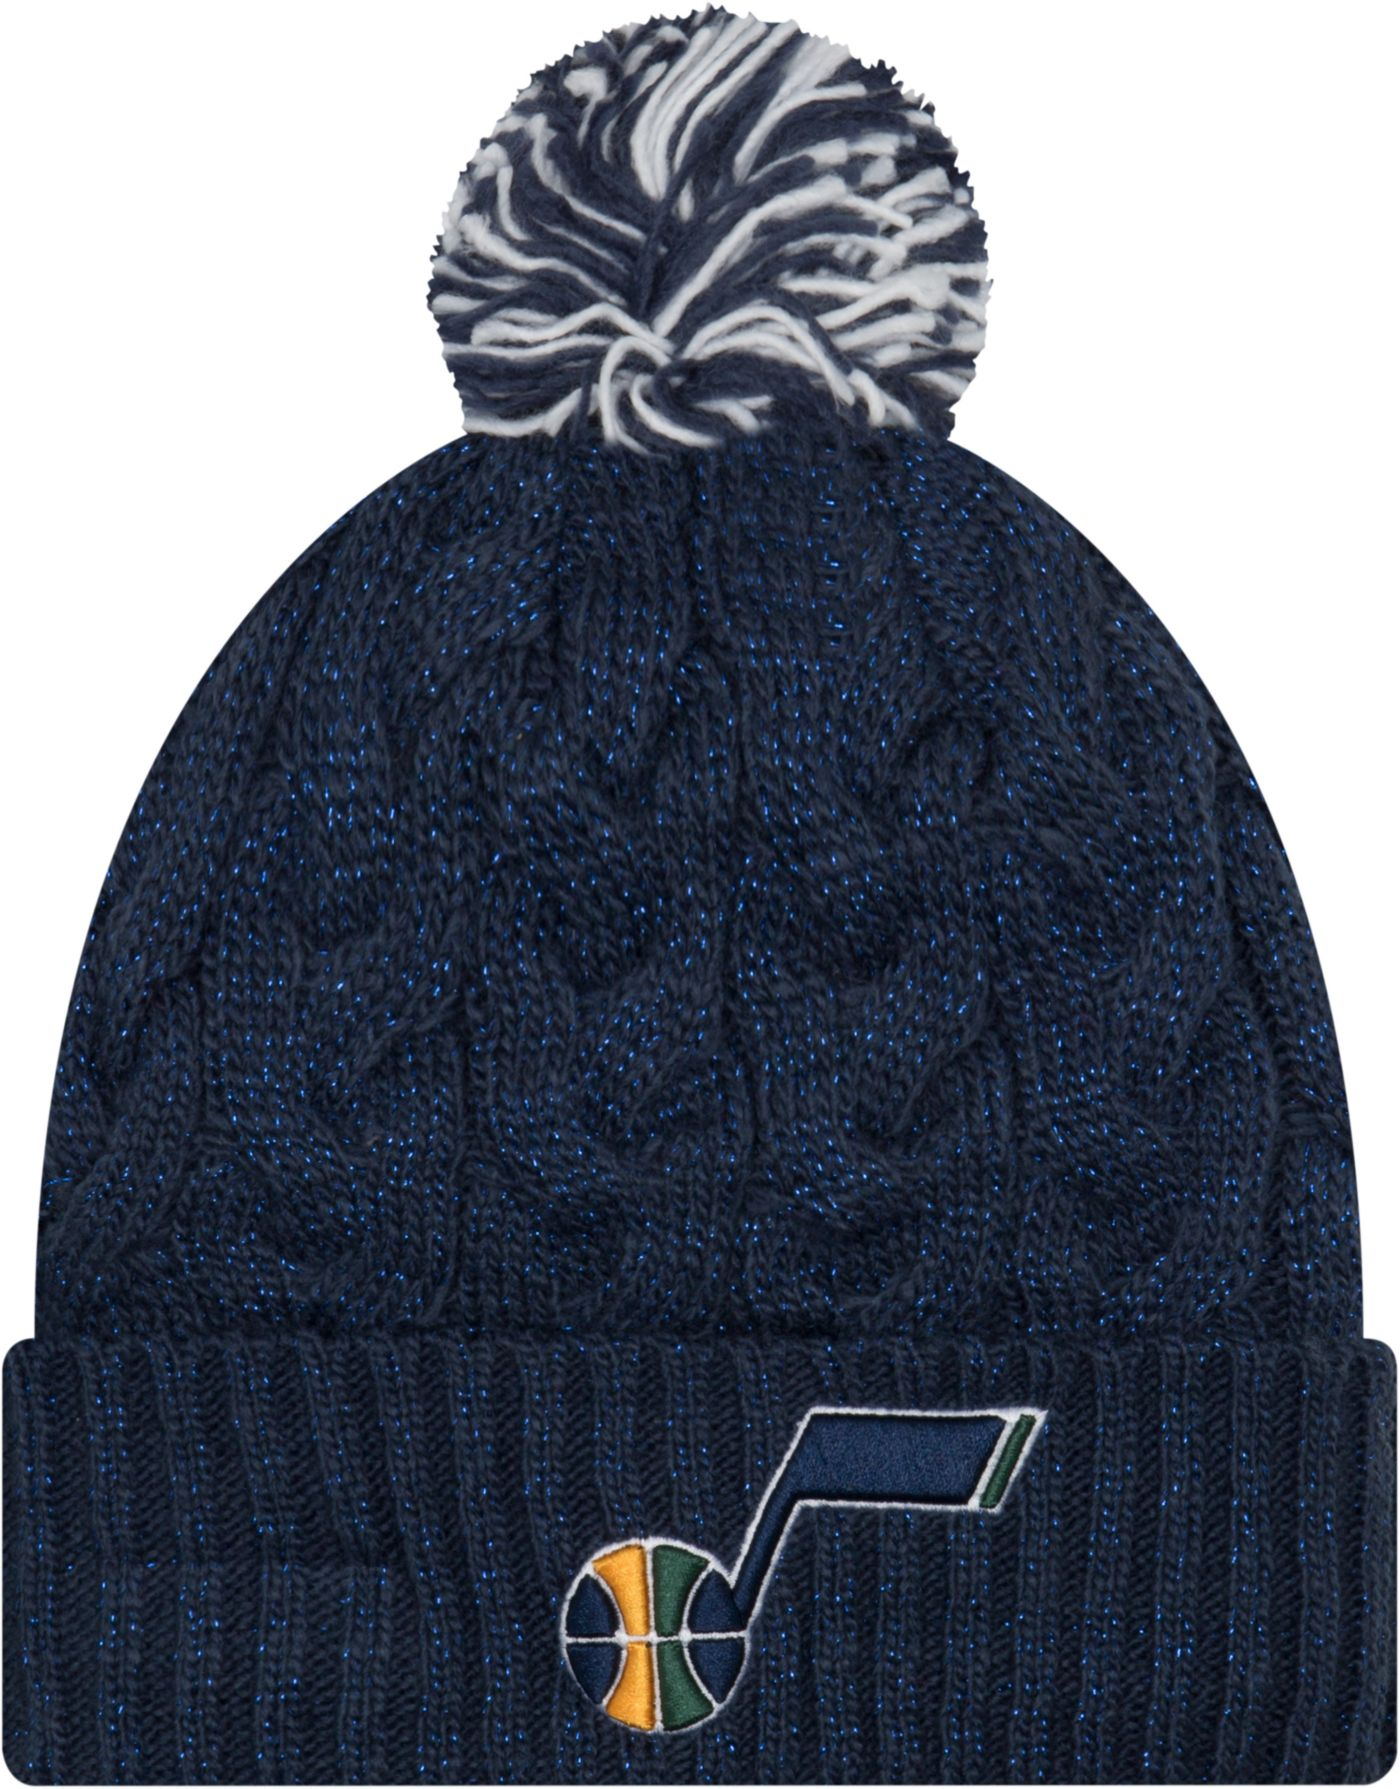 New Era Women's Utah Jazz Cozy Knit Hat